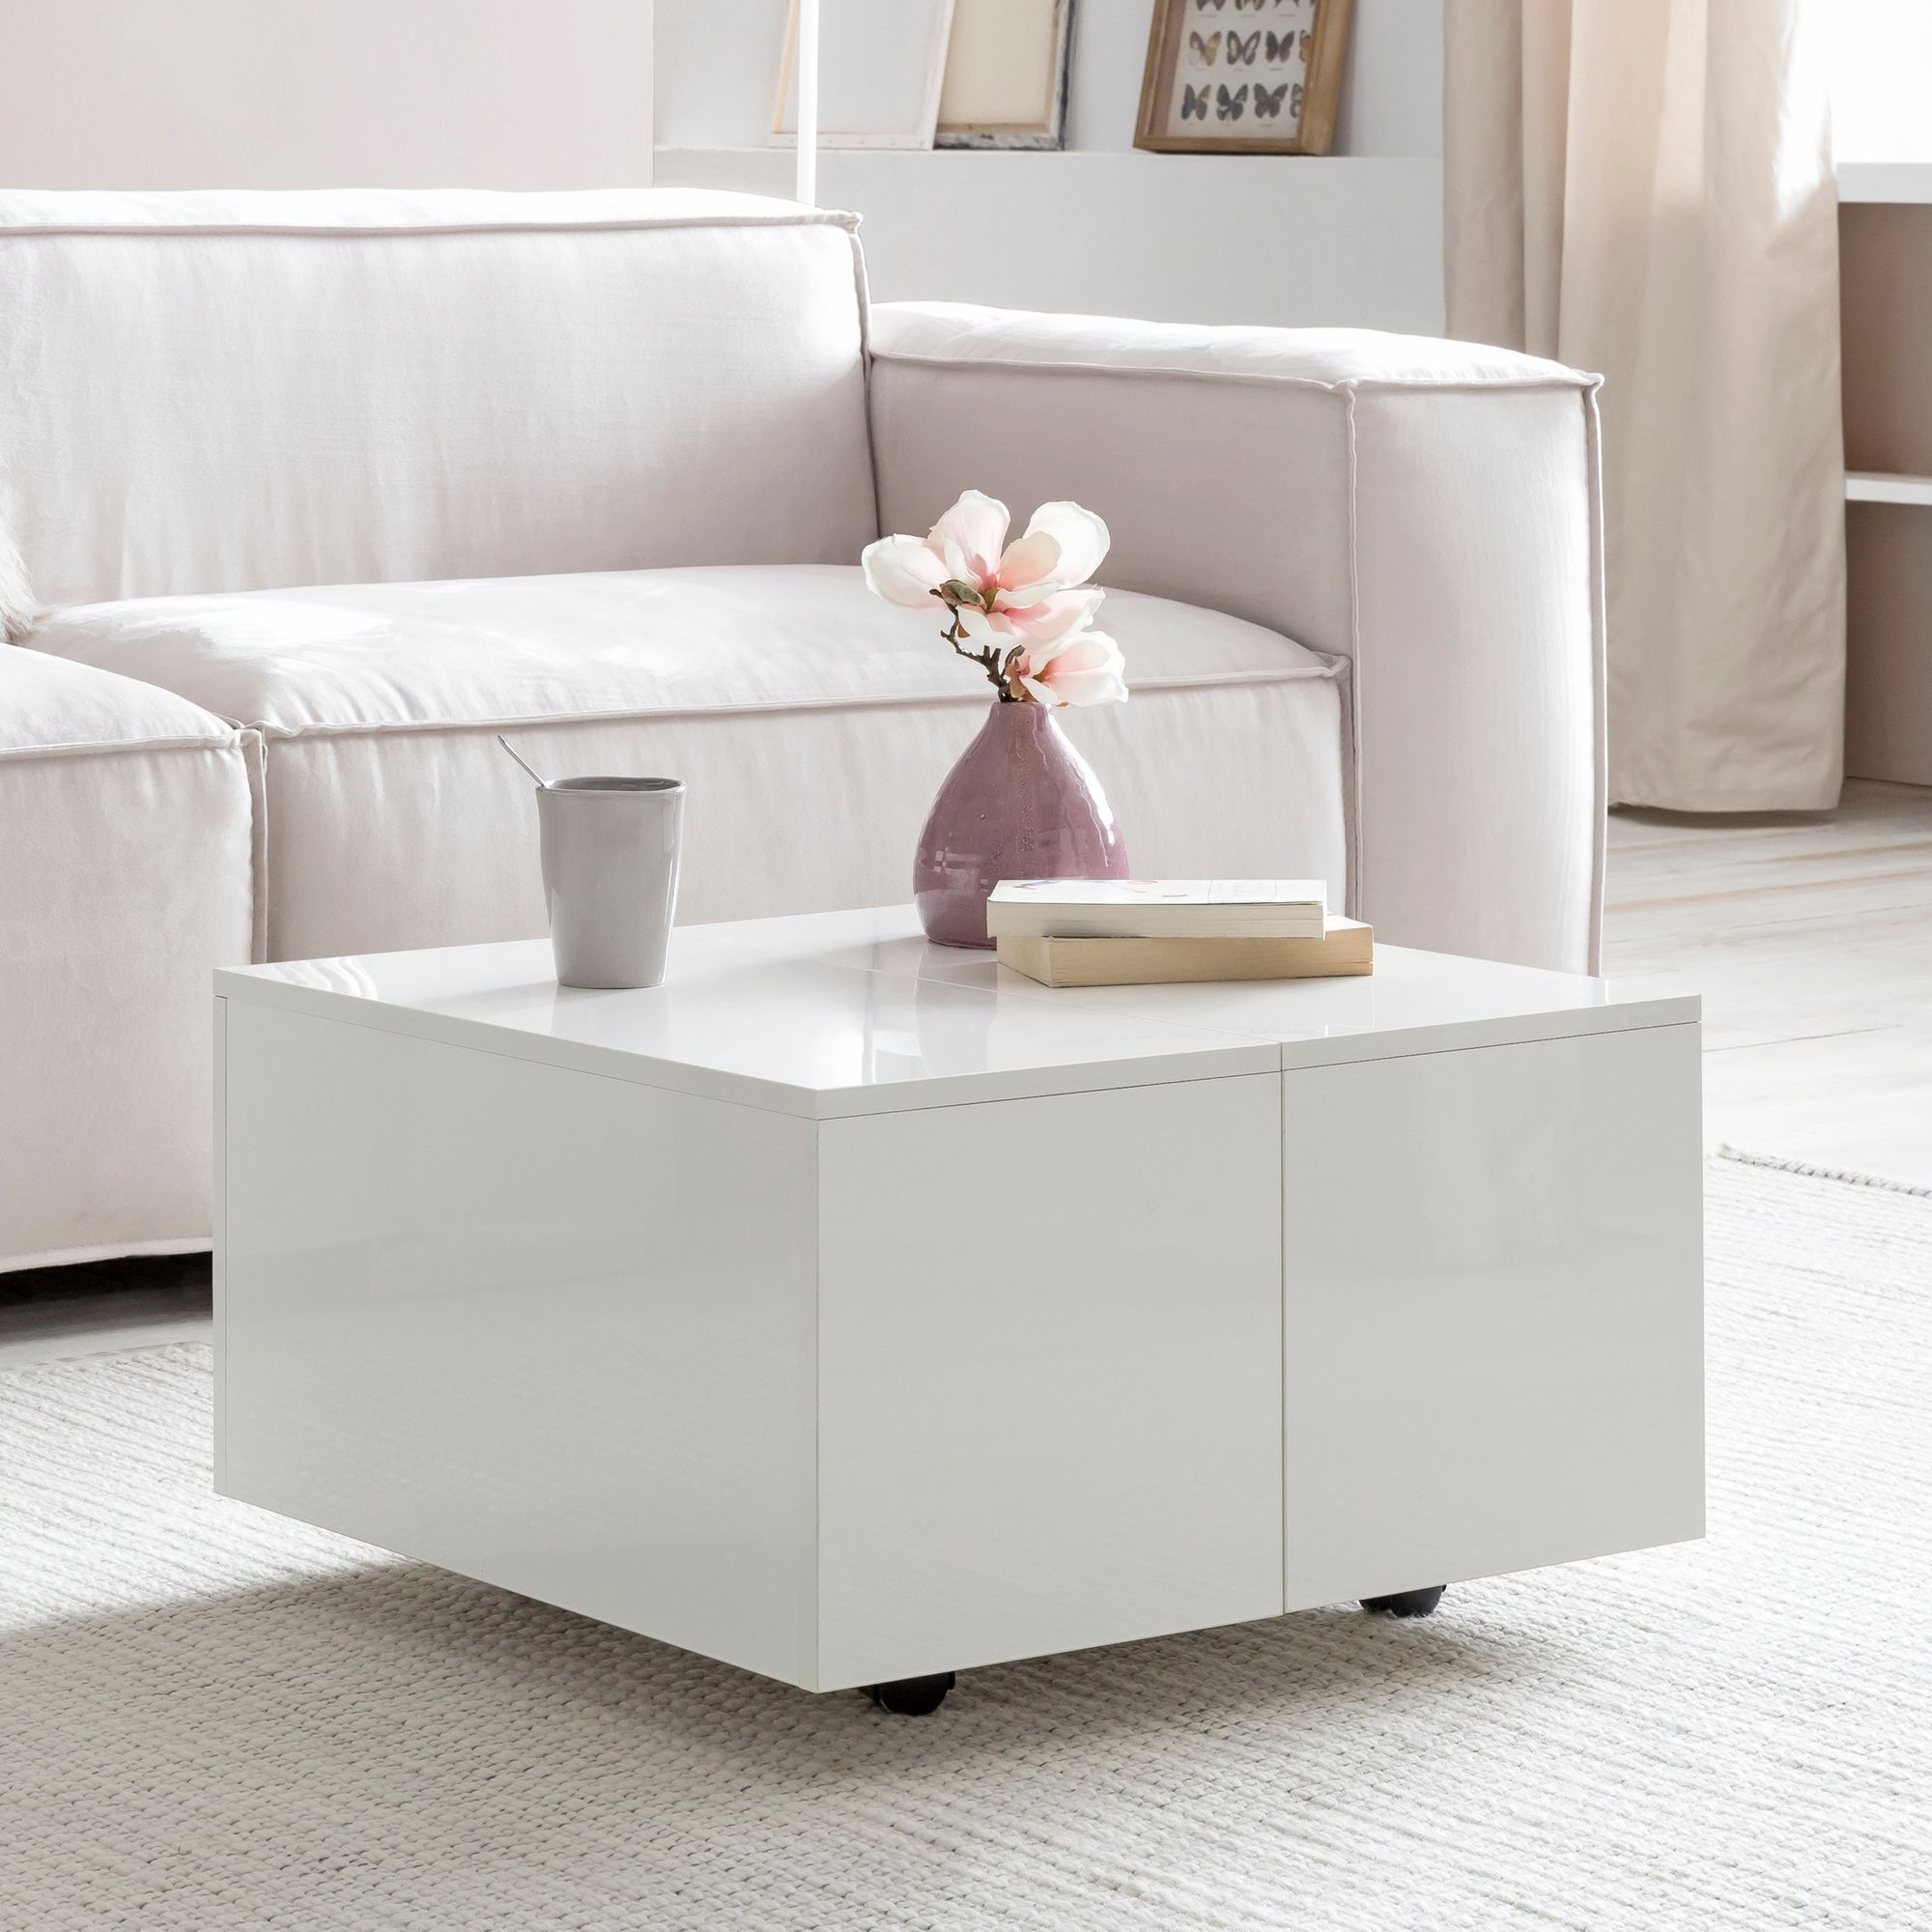 finebuy couchtisch fb52348 wei 60 x 35 x 60 cm holz. Black Bedroom Furniture Sets. Home Design Ideas